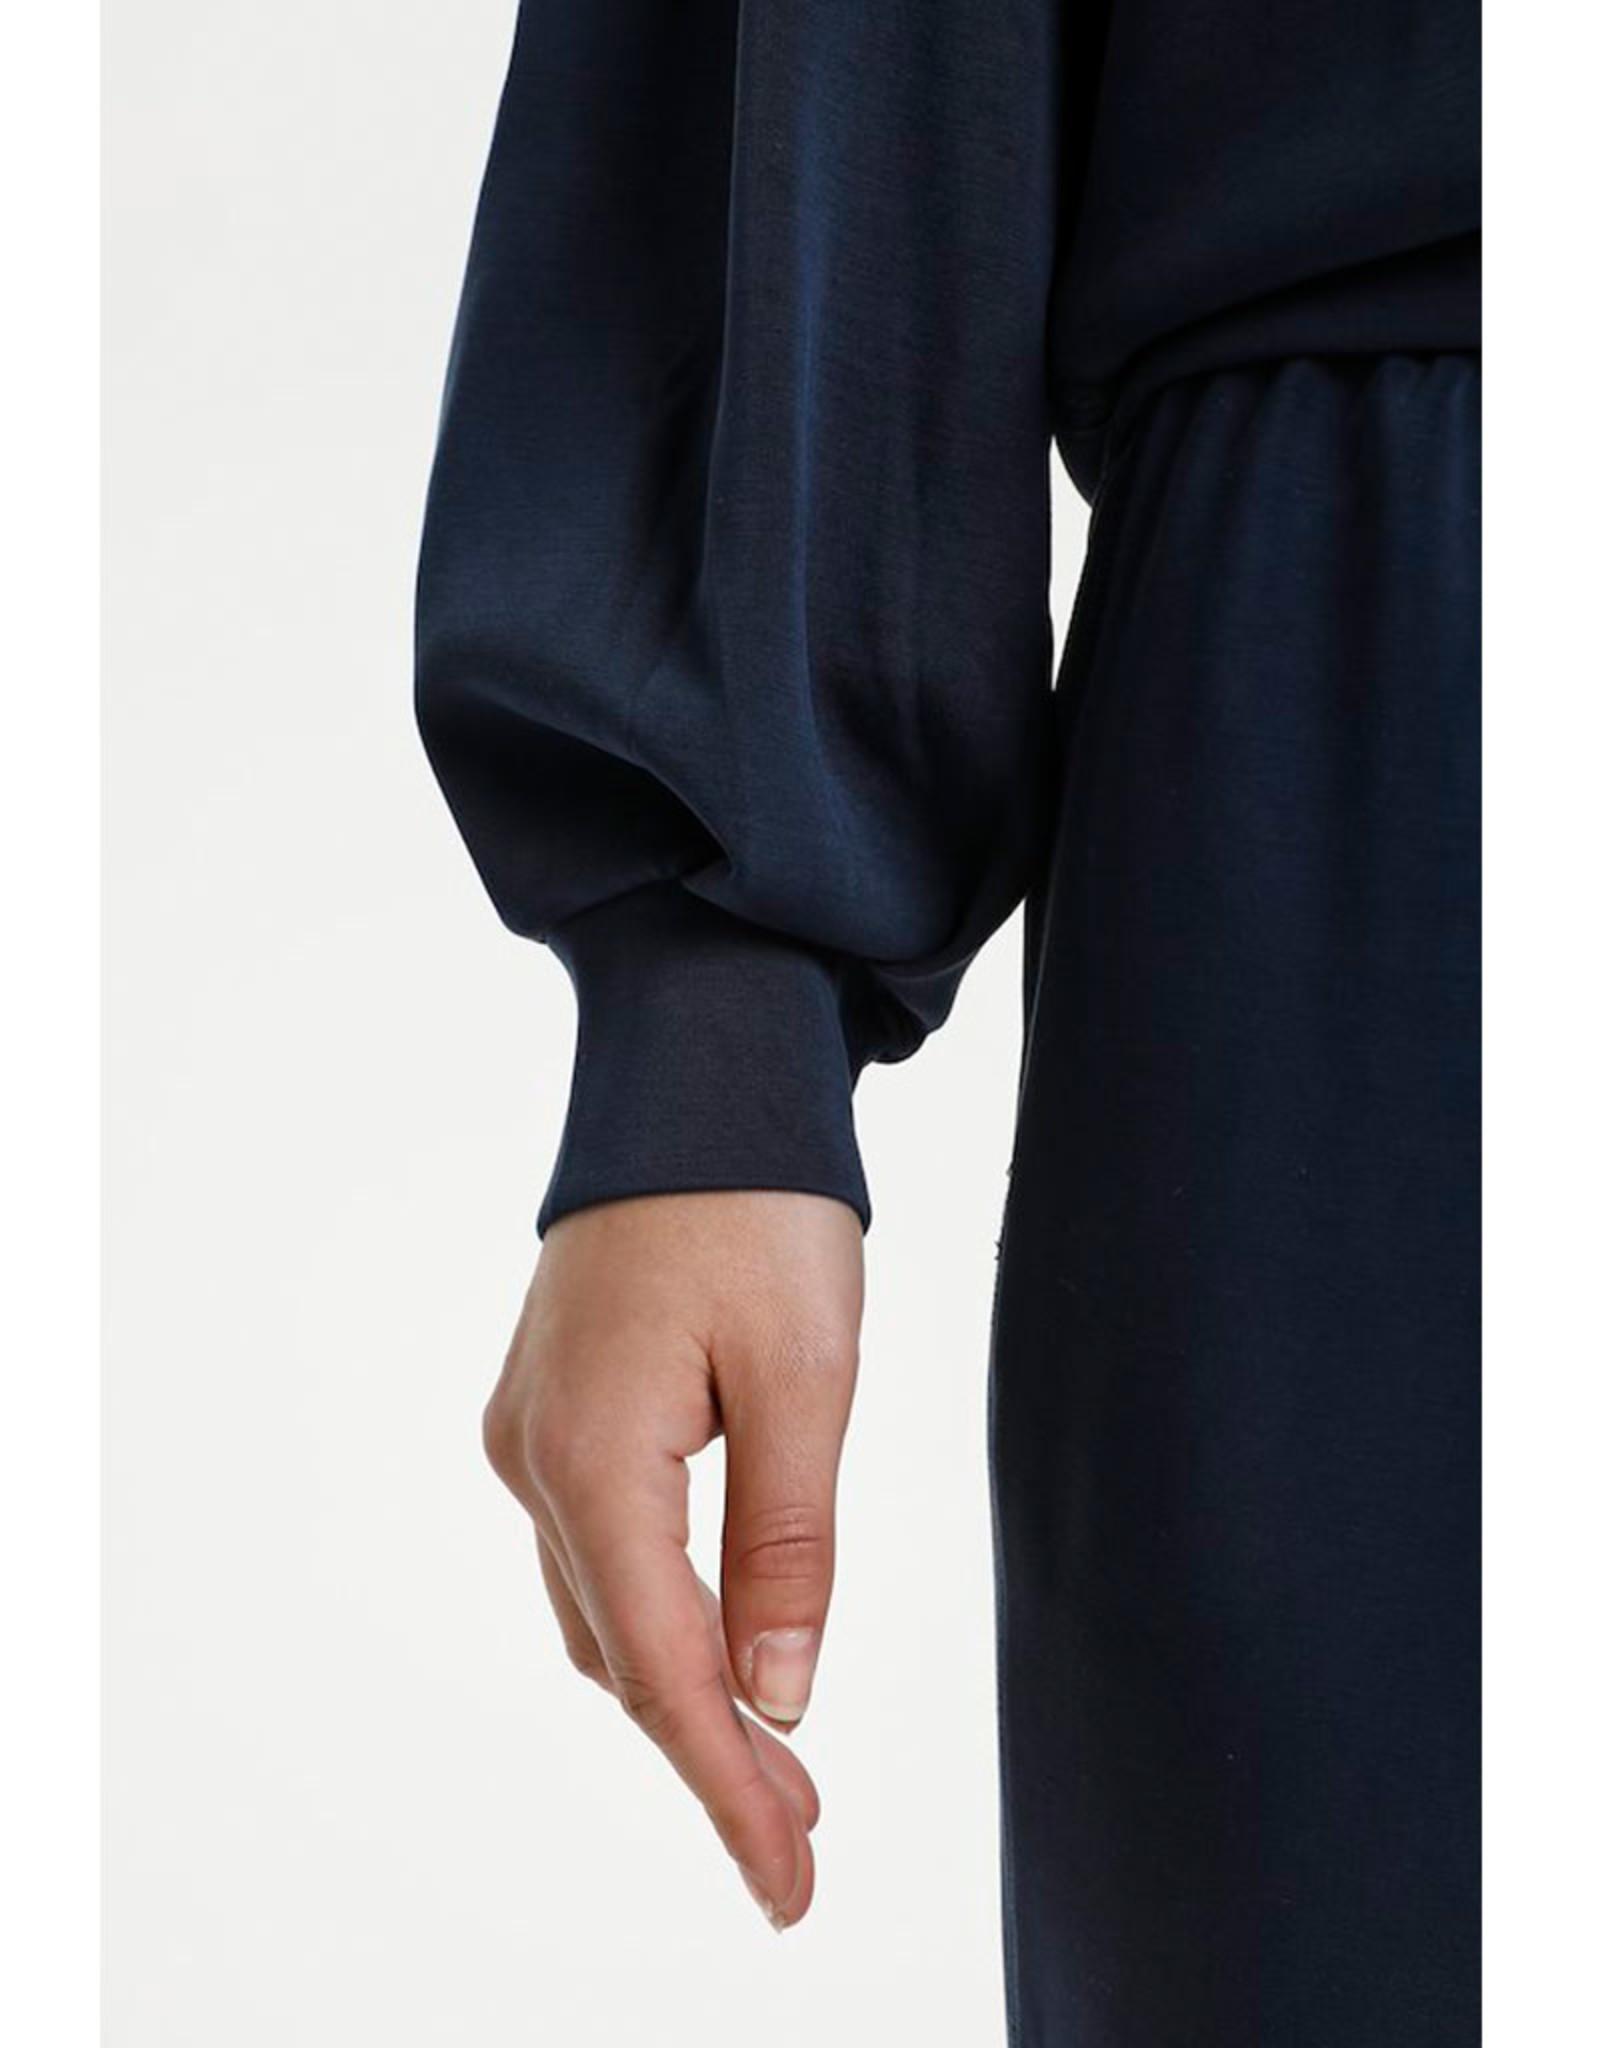 My Essential Wardrobe The Sweat Pant